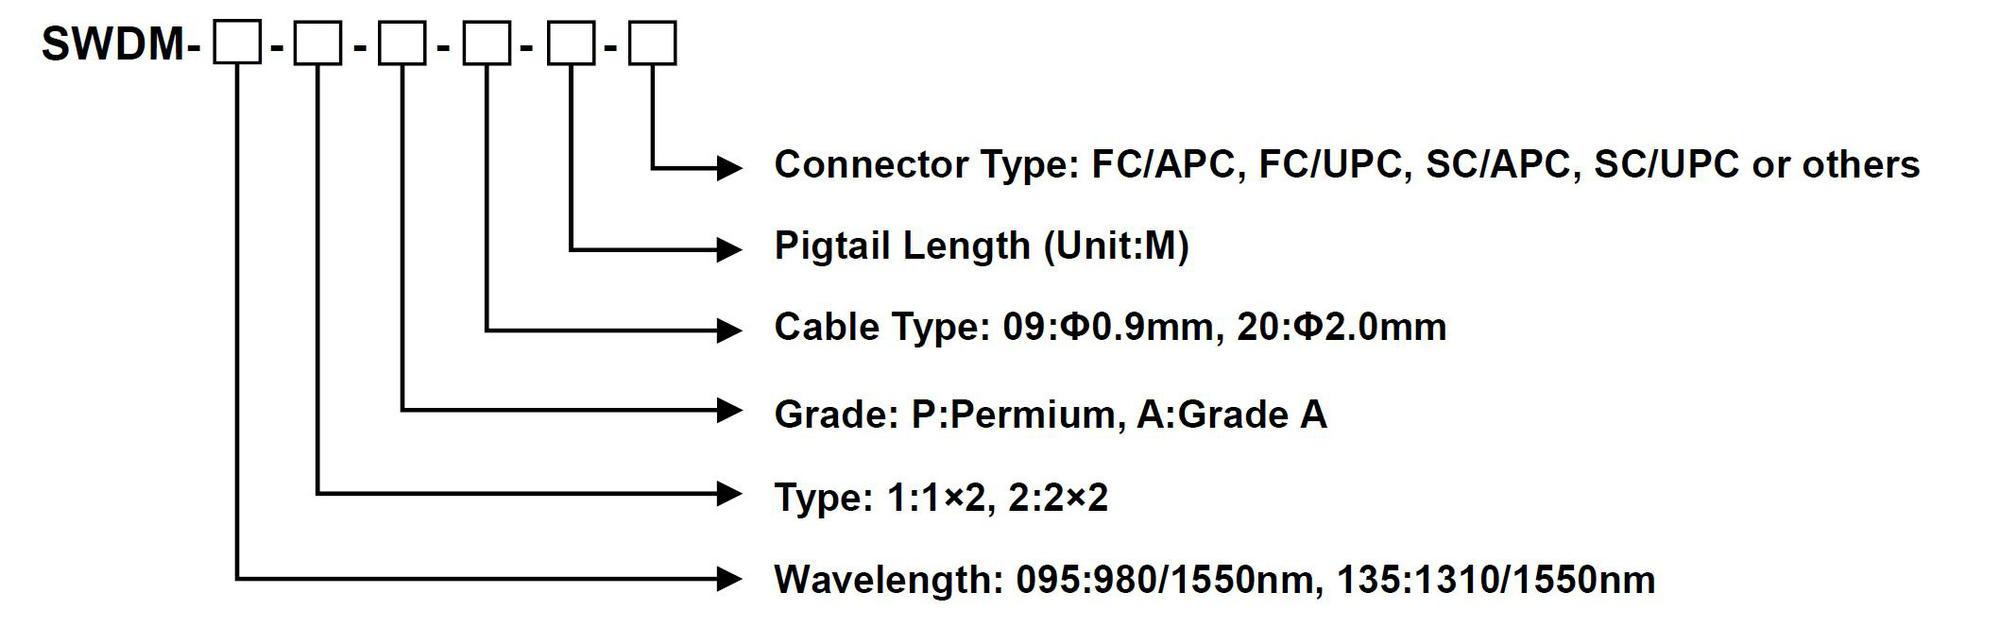 1.8.6 Standard Wavelength Division Multiplexer